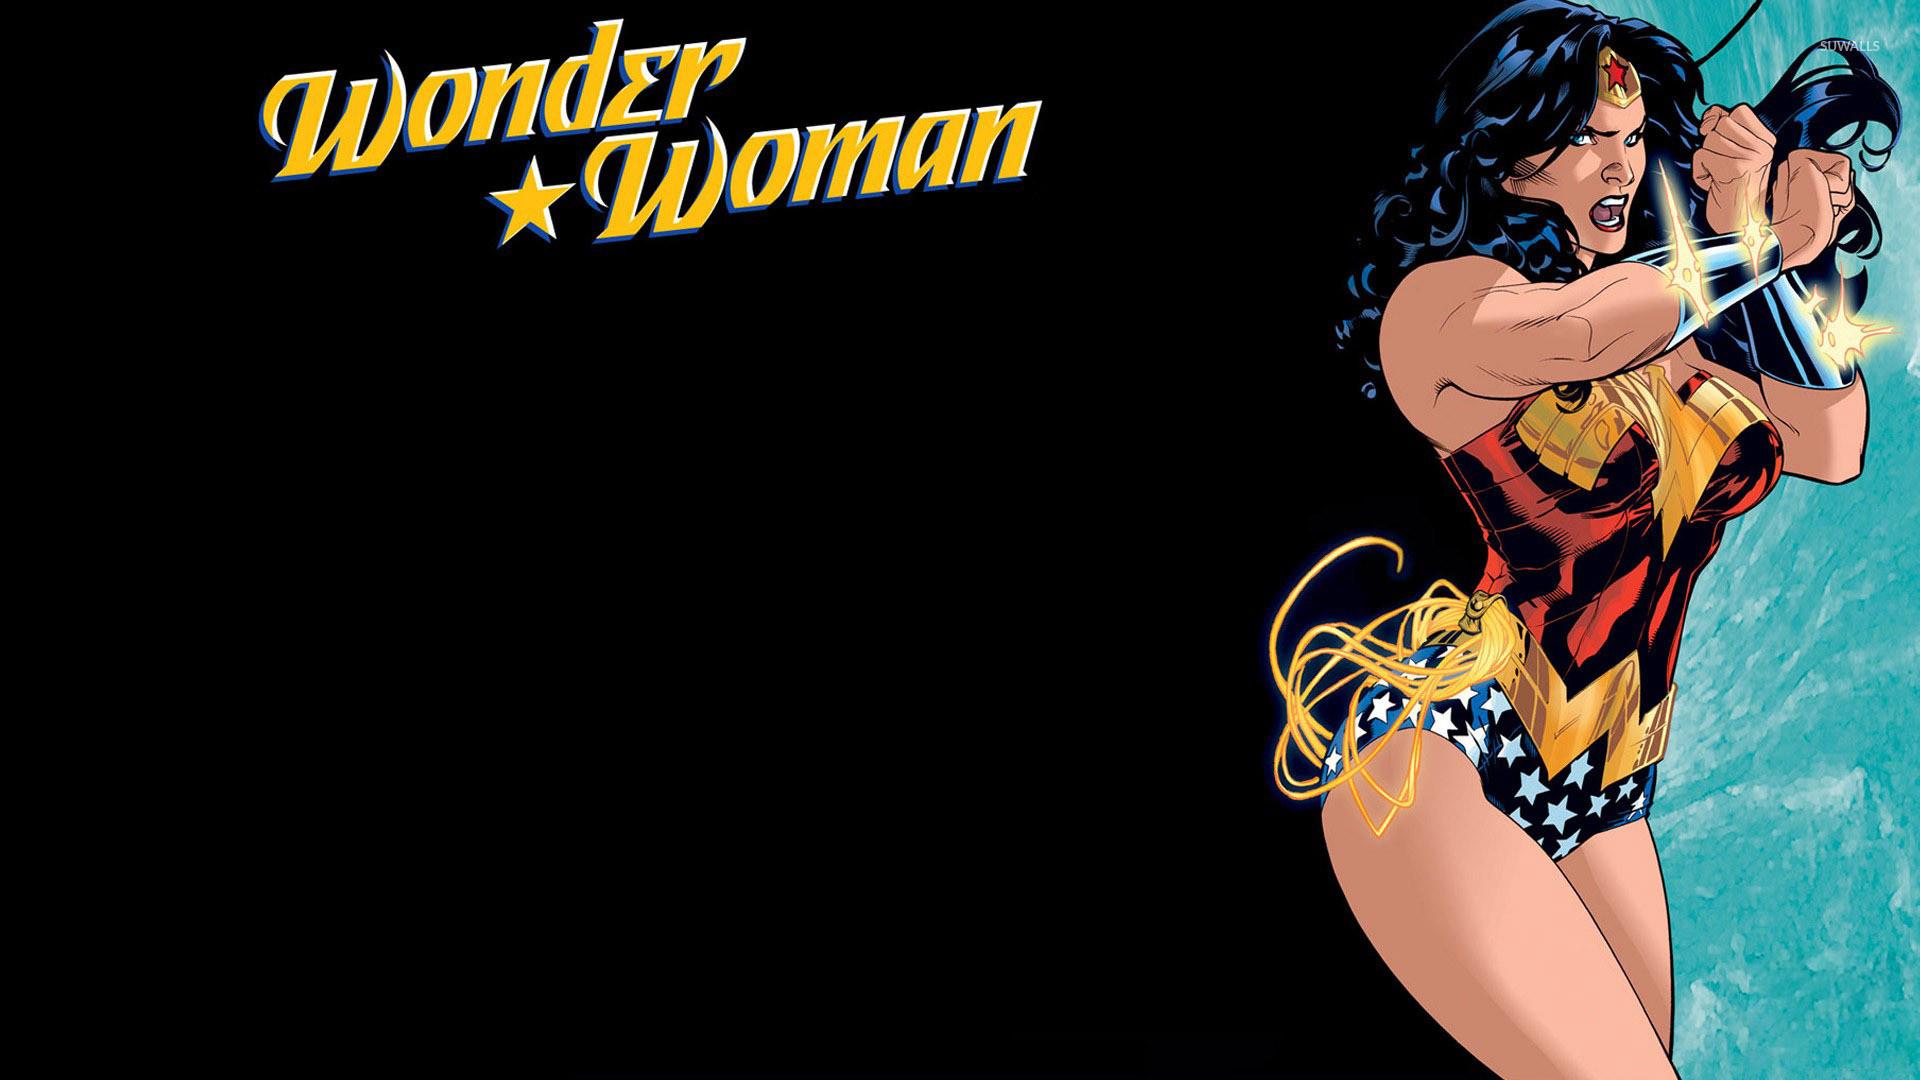 Res: 1920x1080, Wonder Woman [8] wallpaper